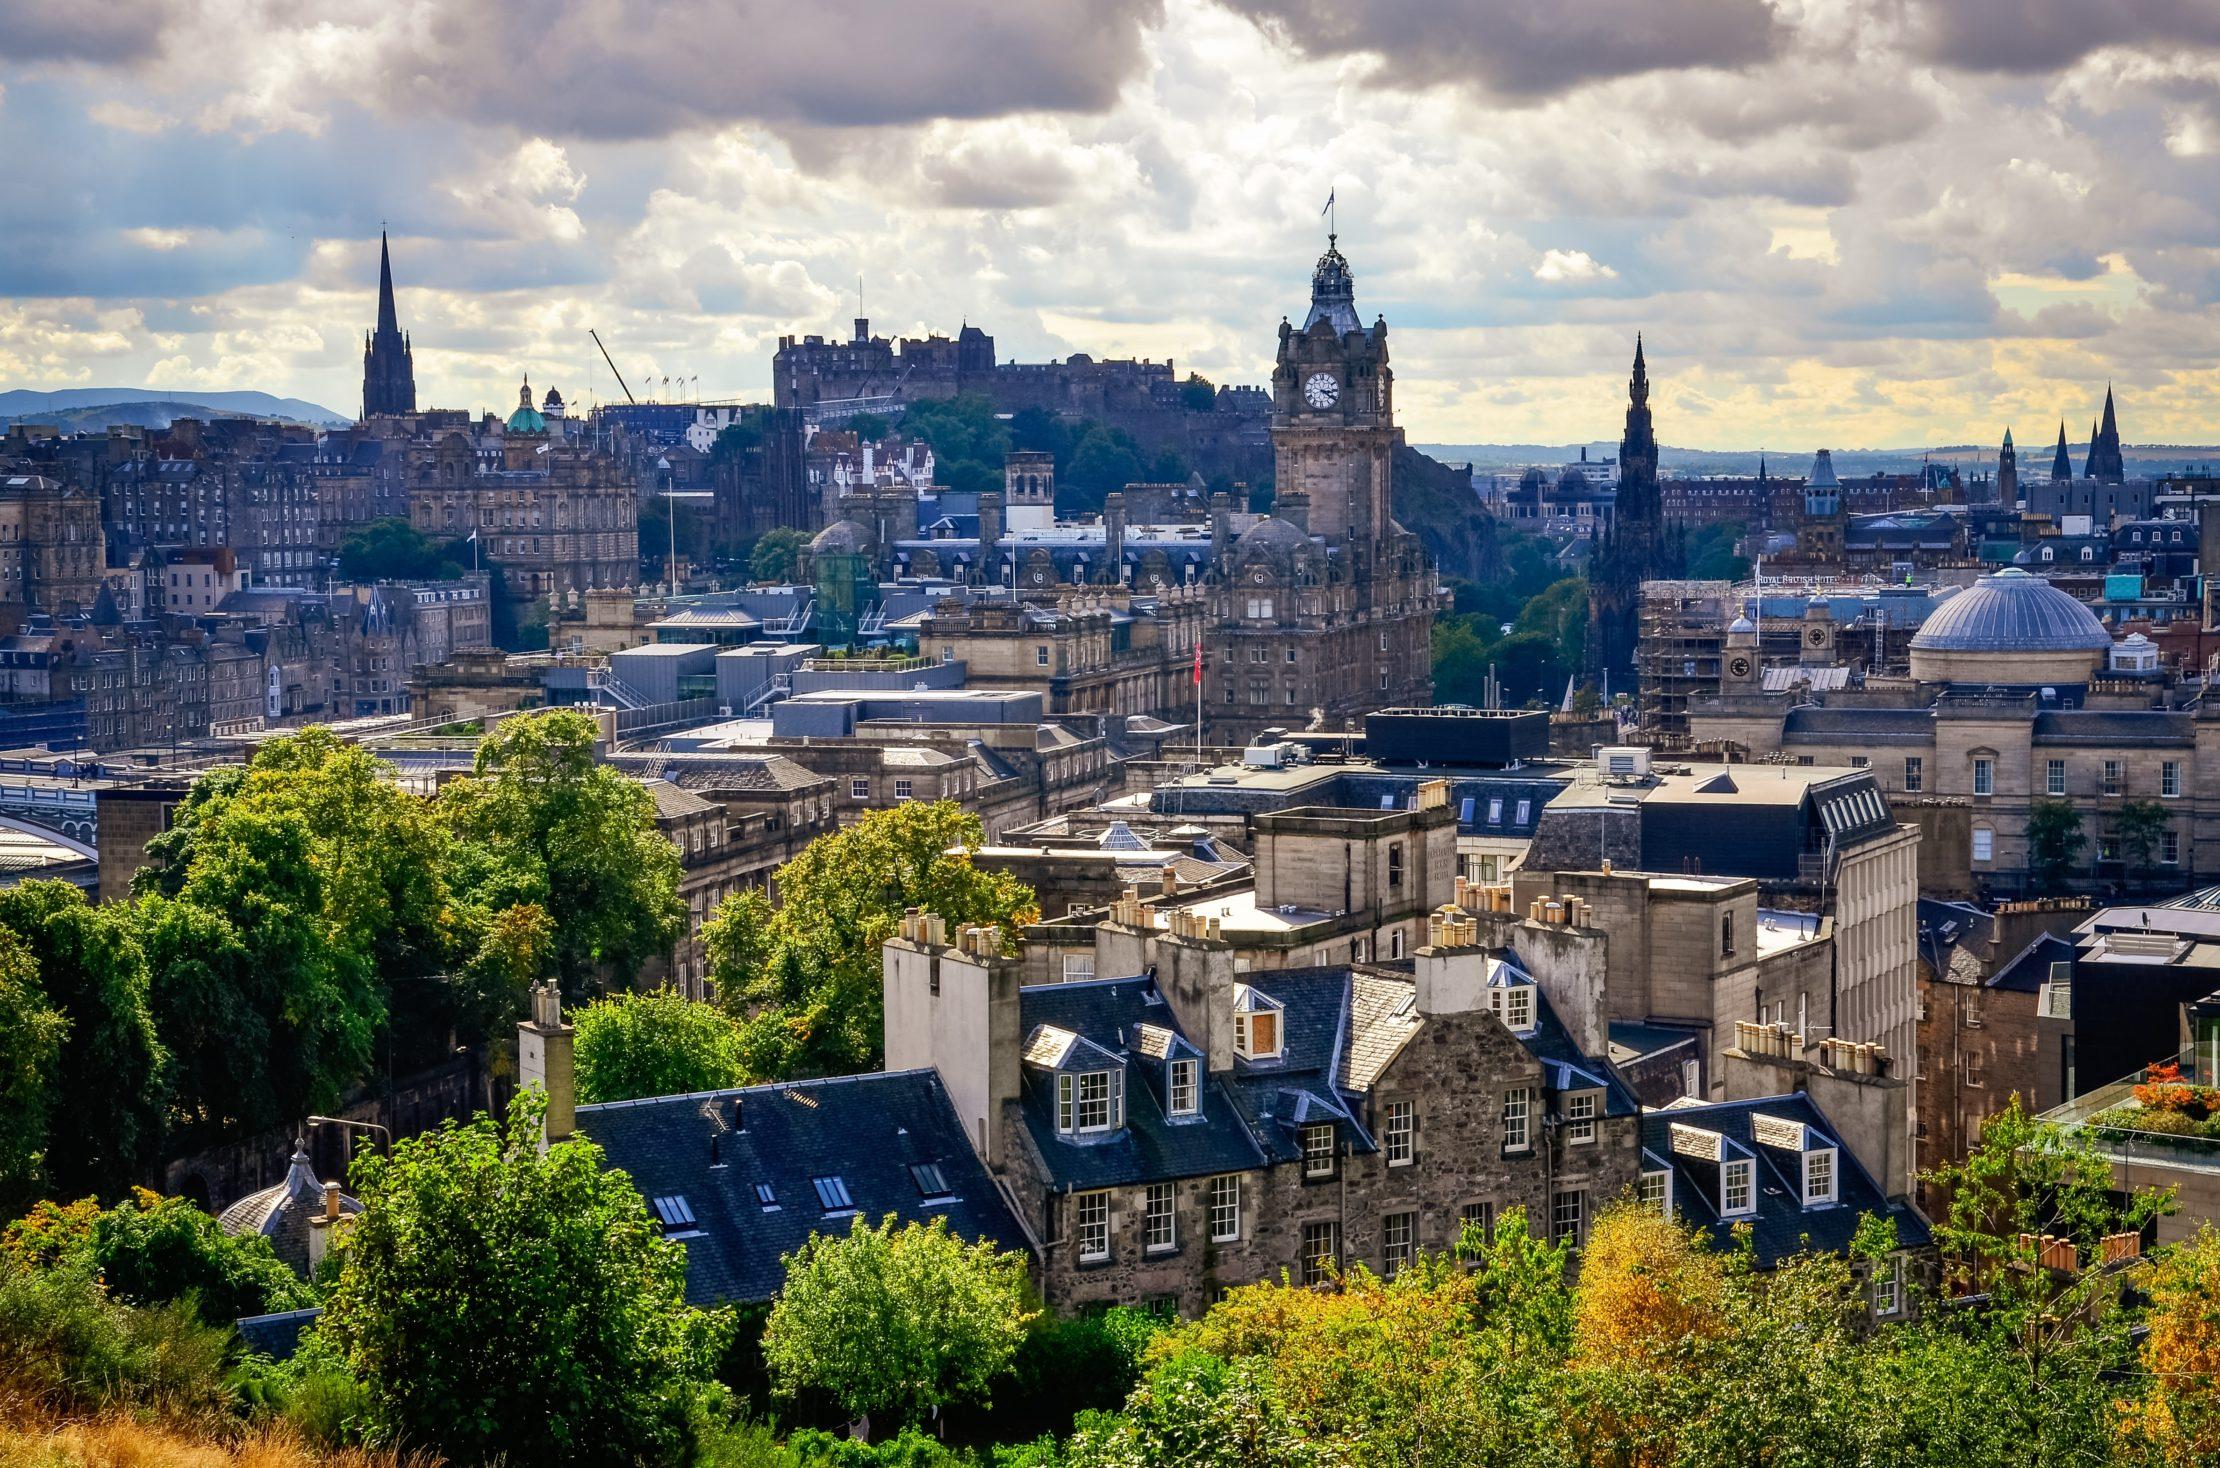 Viajar a Edimburgo y Motivos para visitar Edimburgo